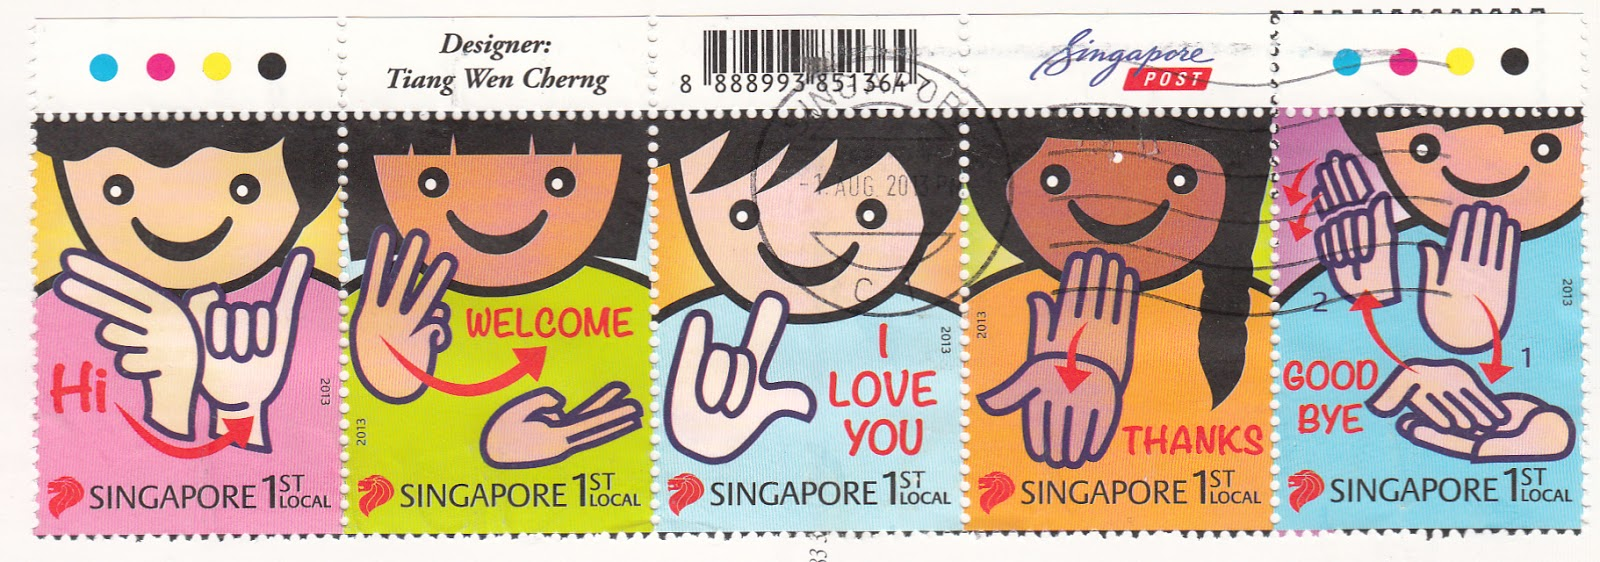 Singapore Language Greetings Images Greetings Card Design Simple